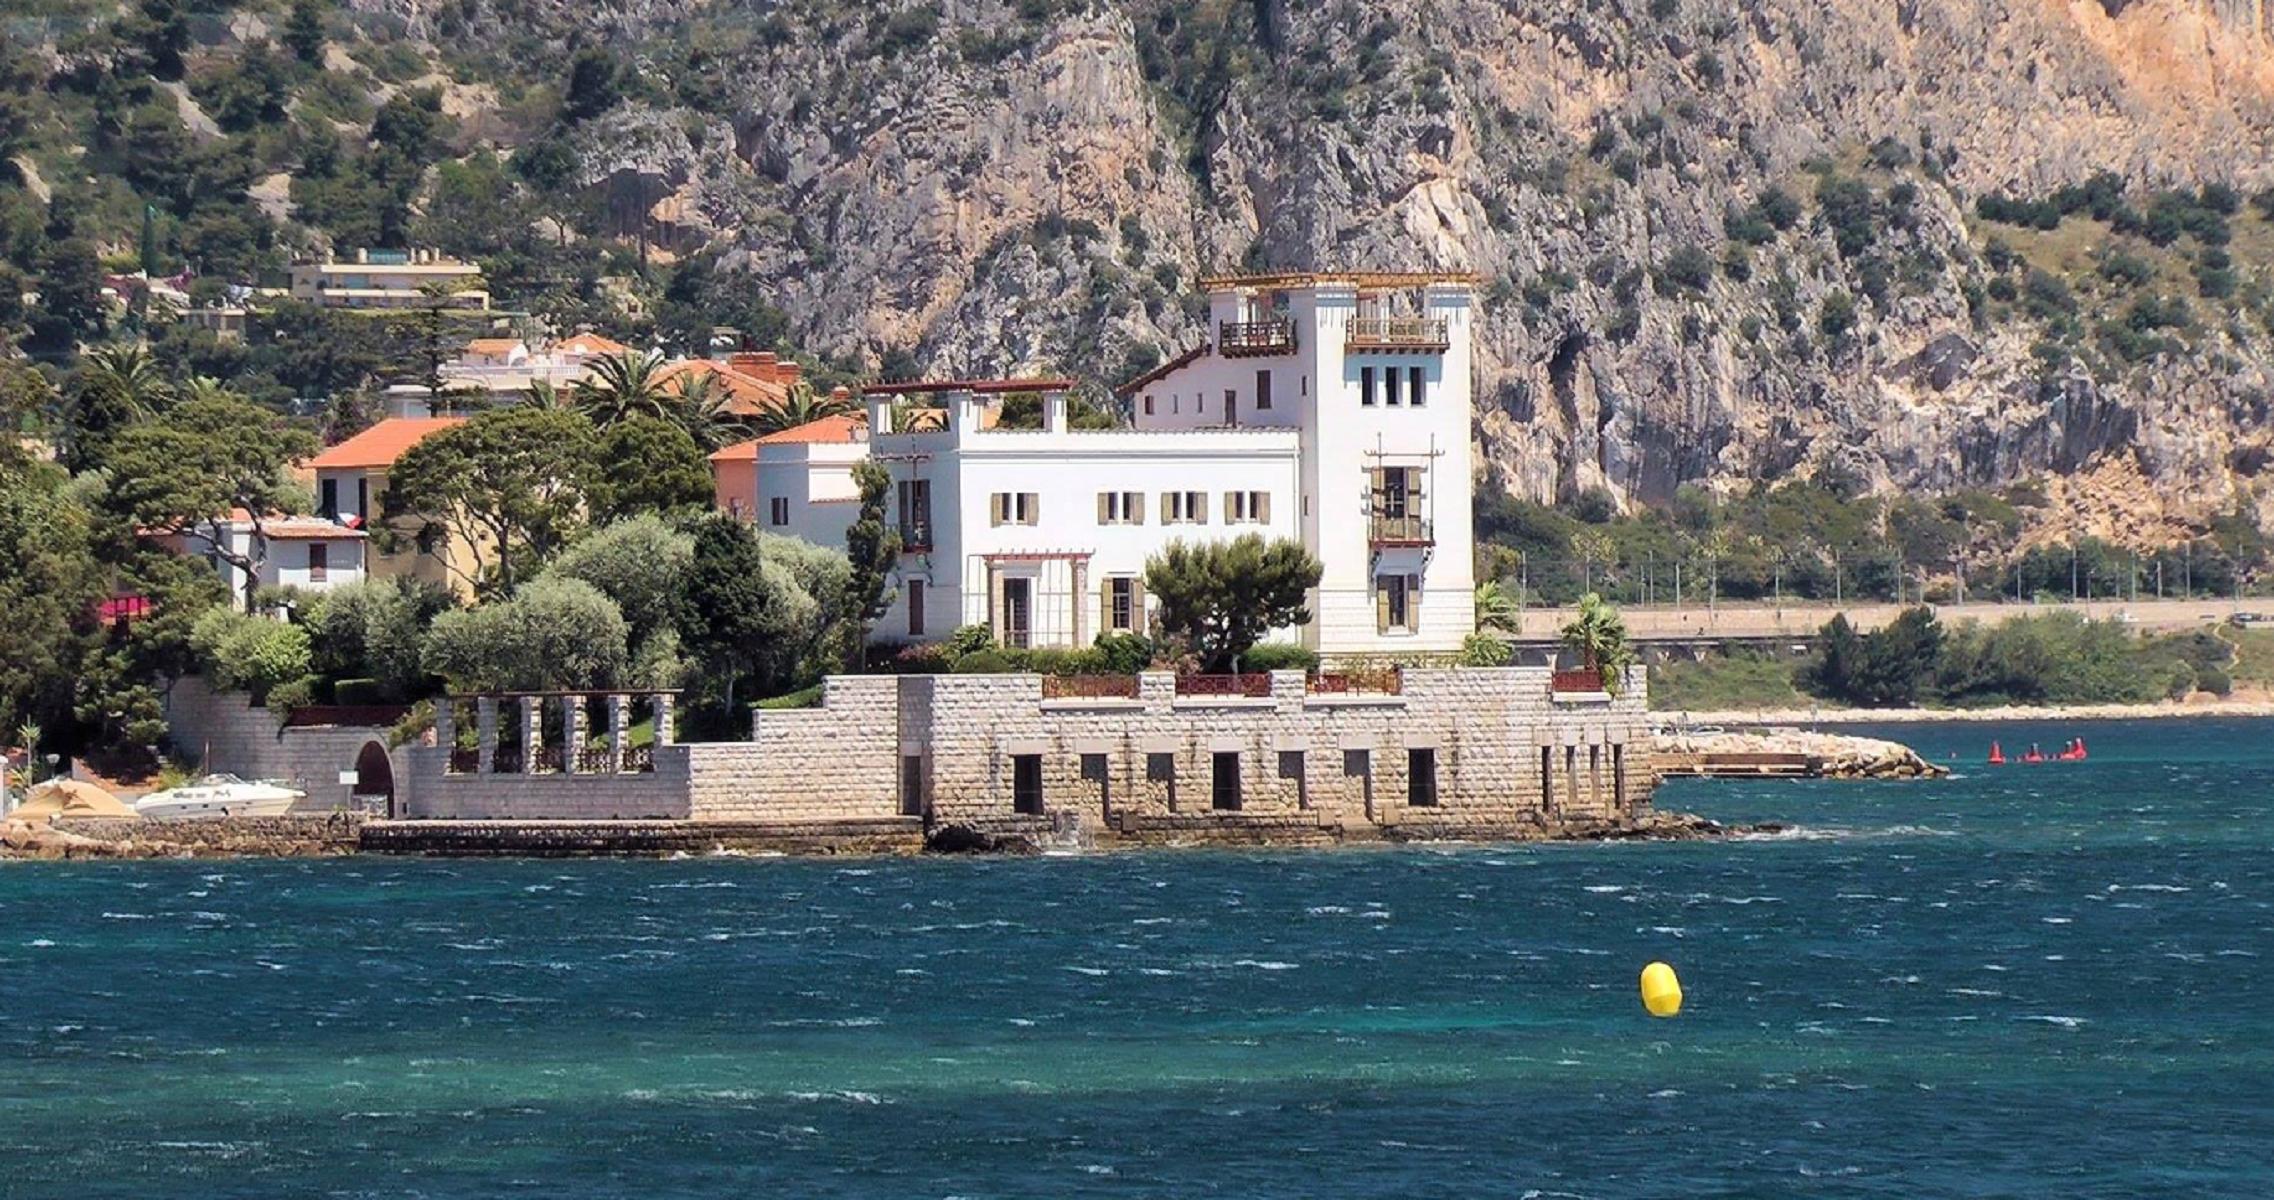 Costa Azzurra, la villa segreta di Karl Lagerfeld